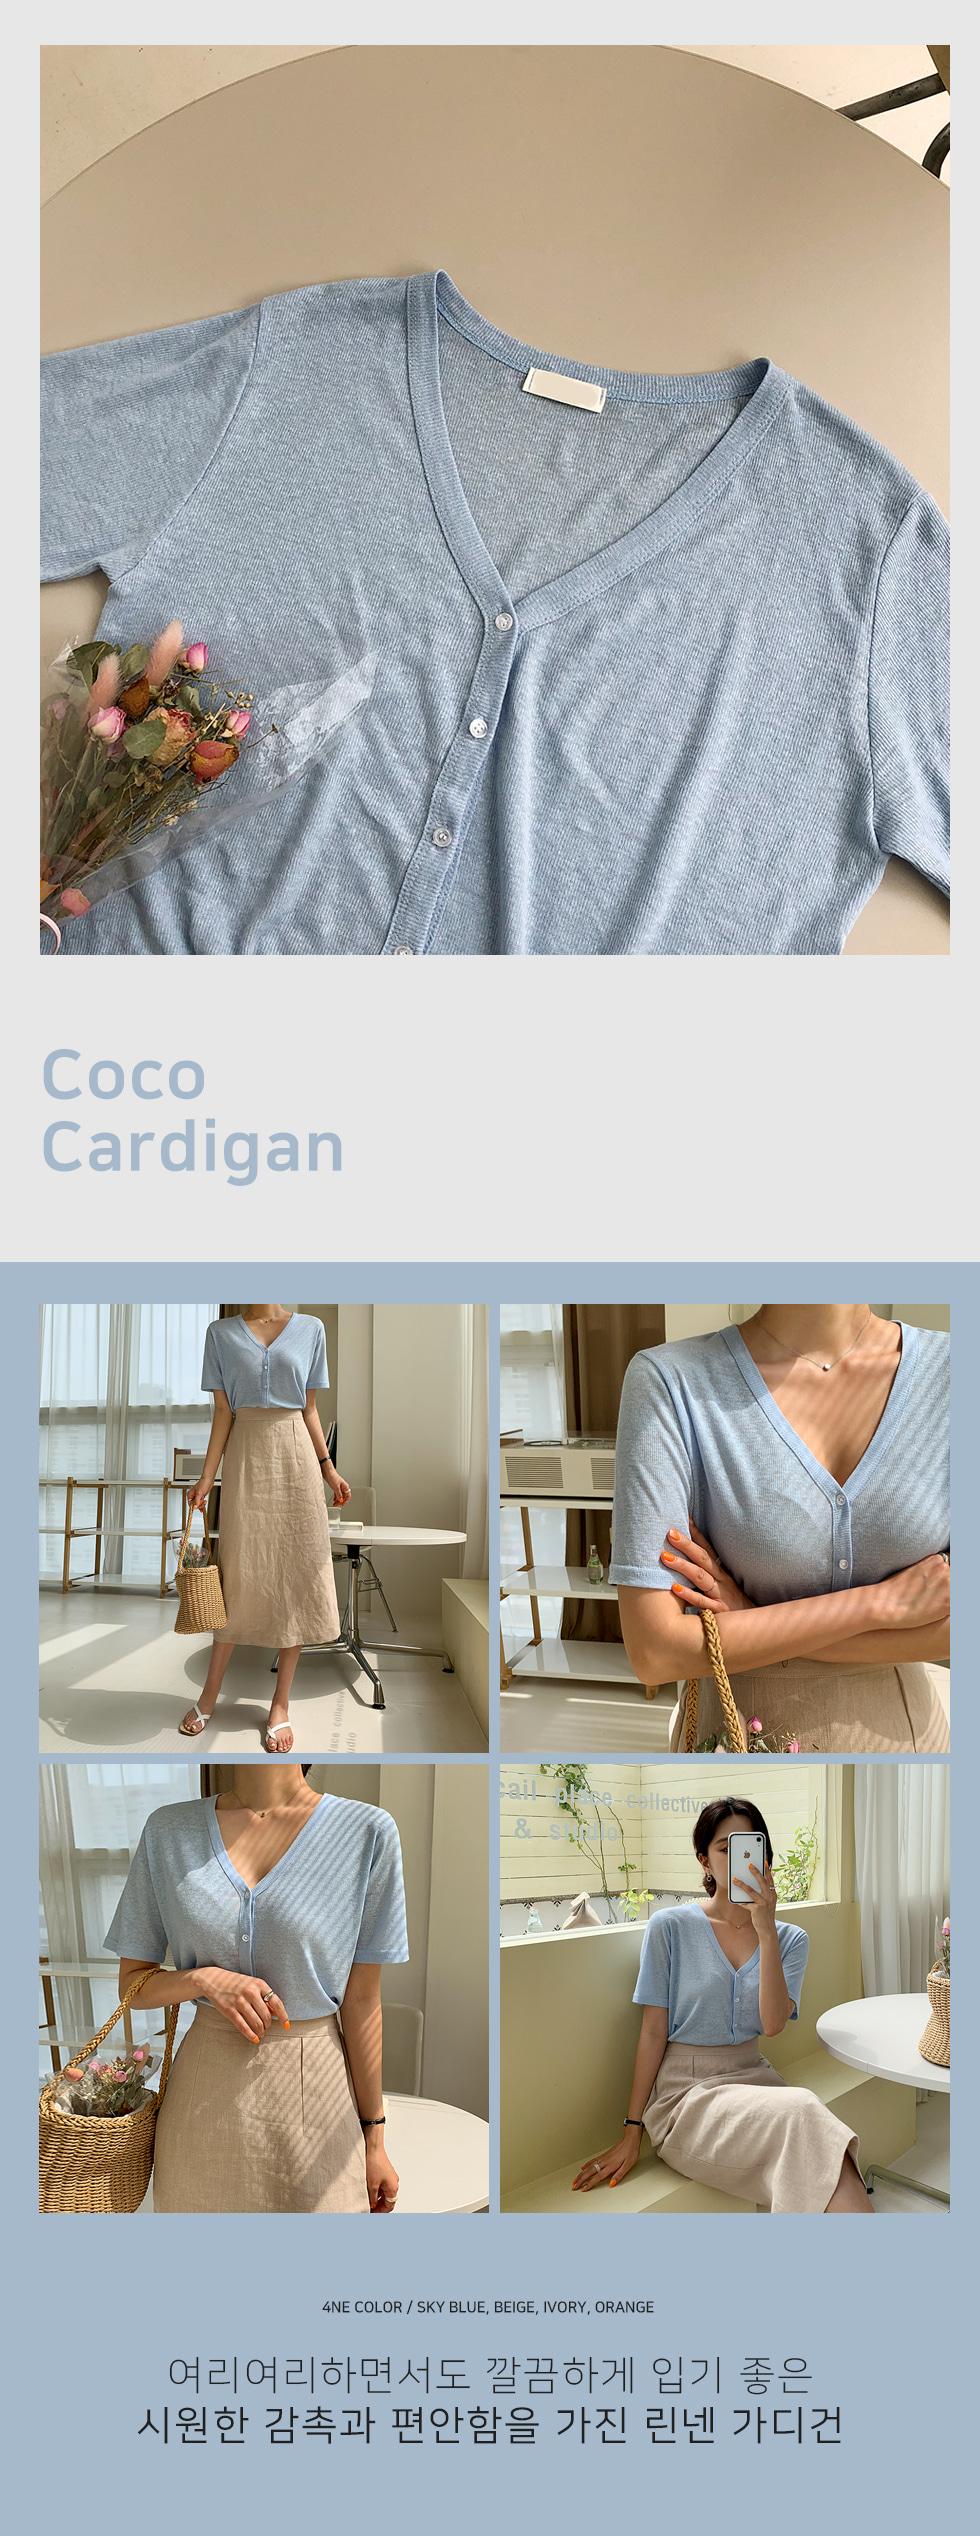 Coco short sleeve cardigan